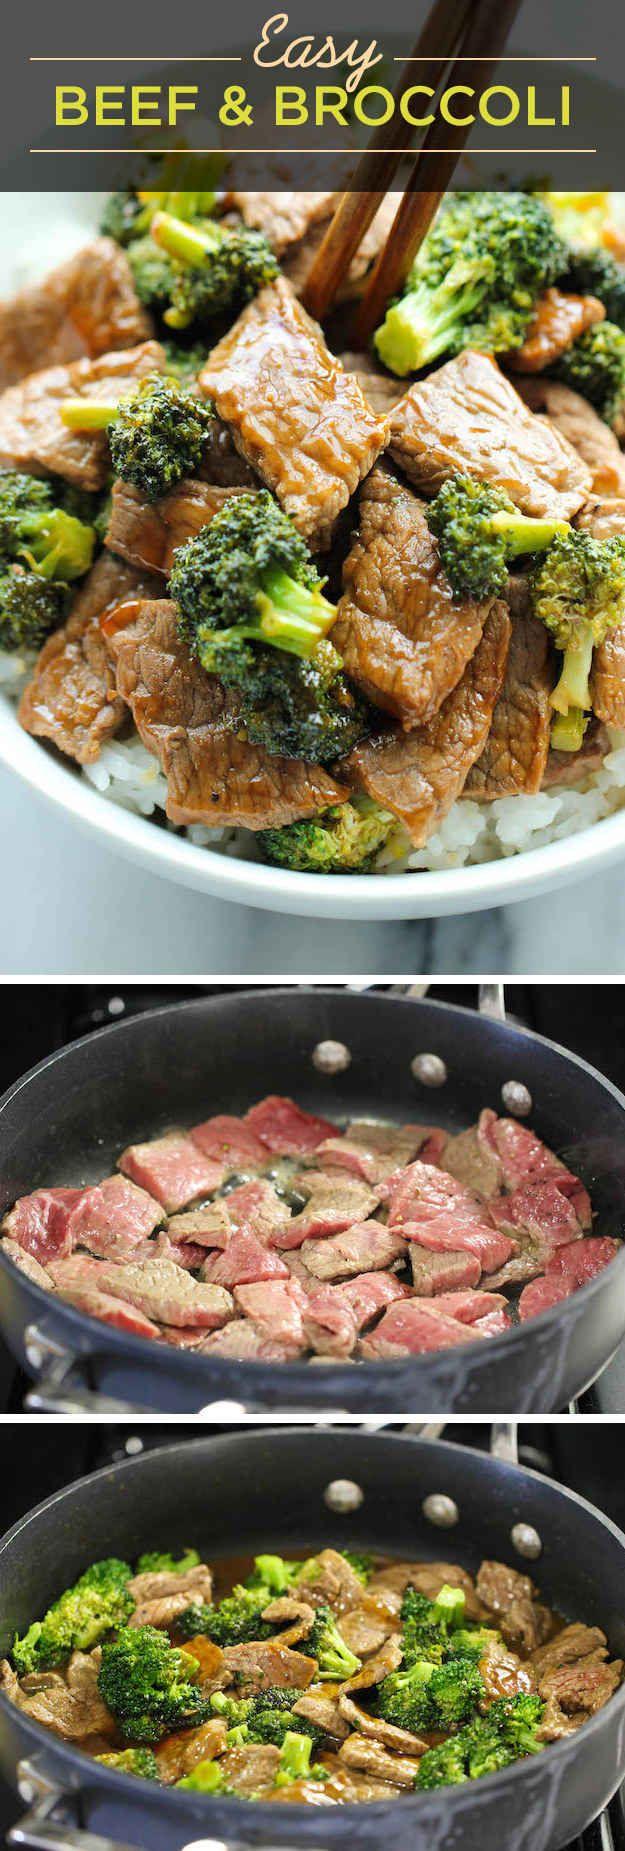 7 Busy Week Night Recipes